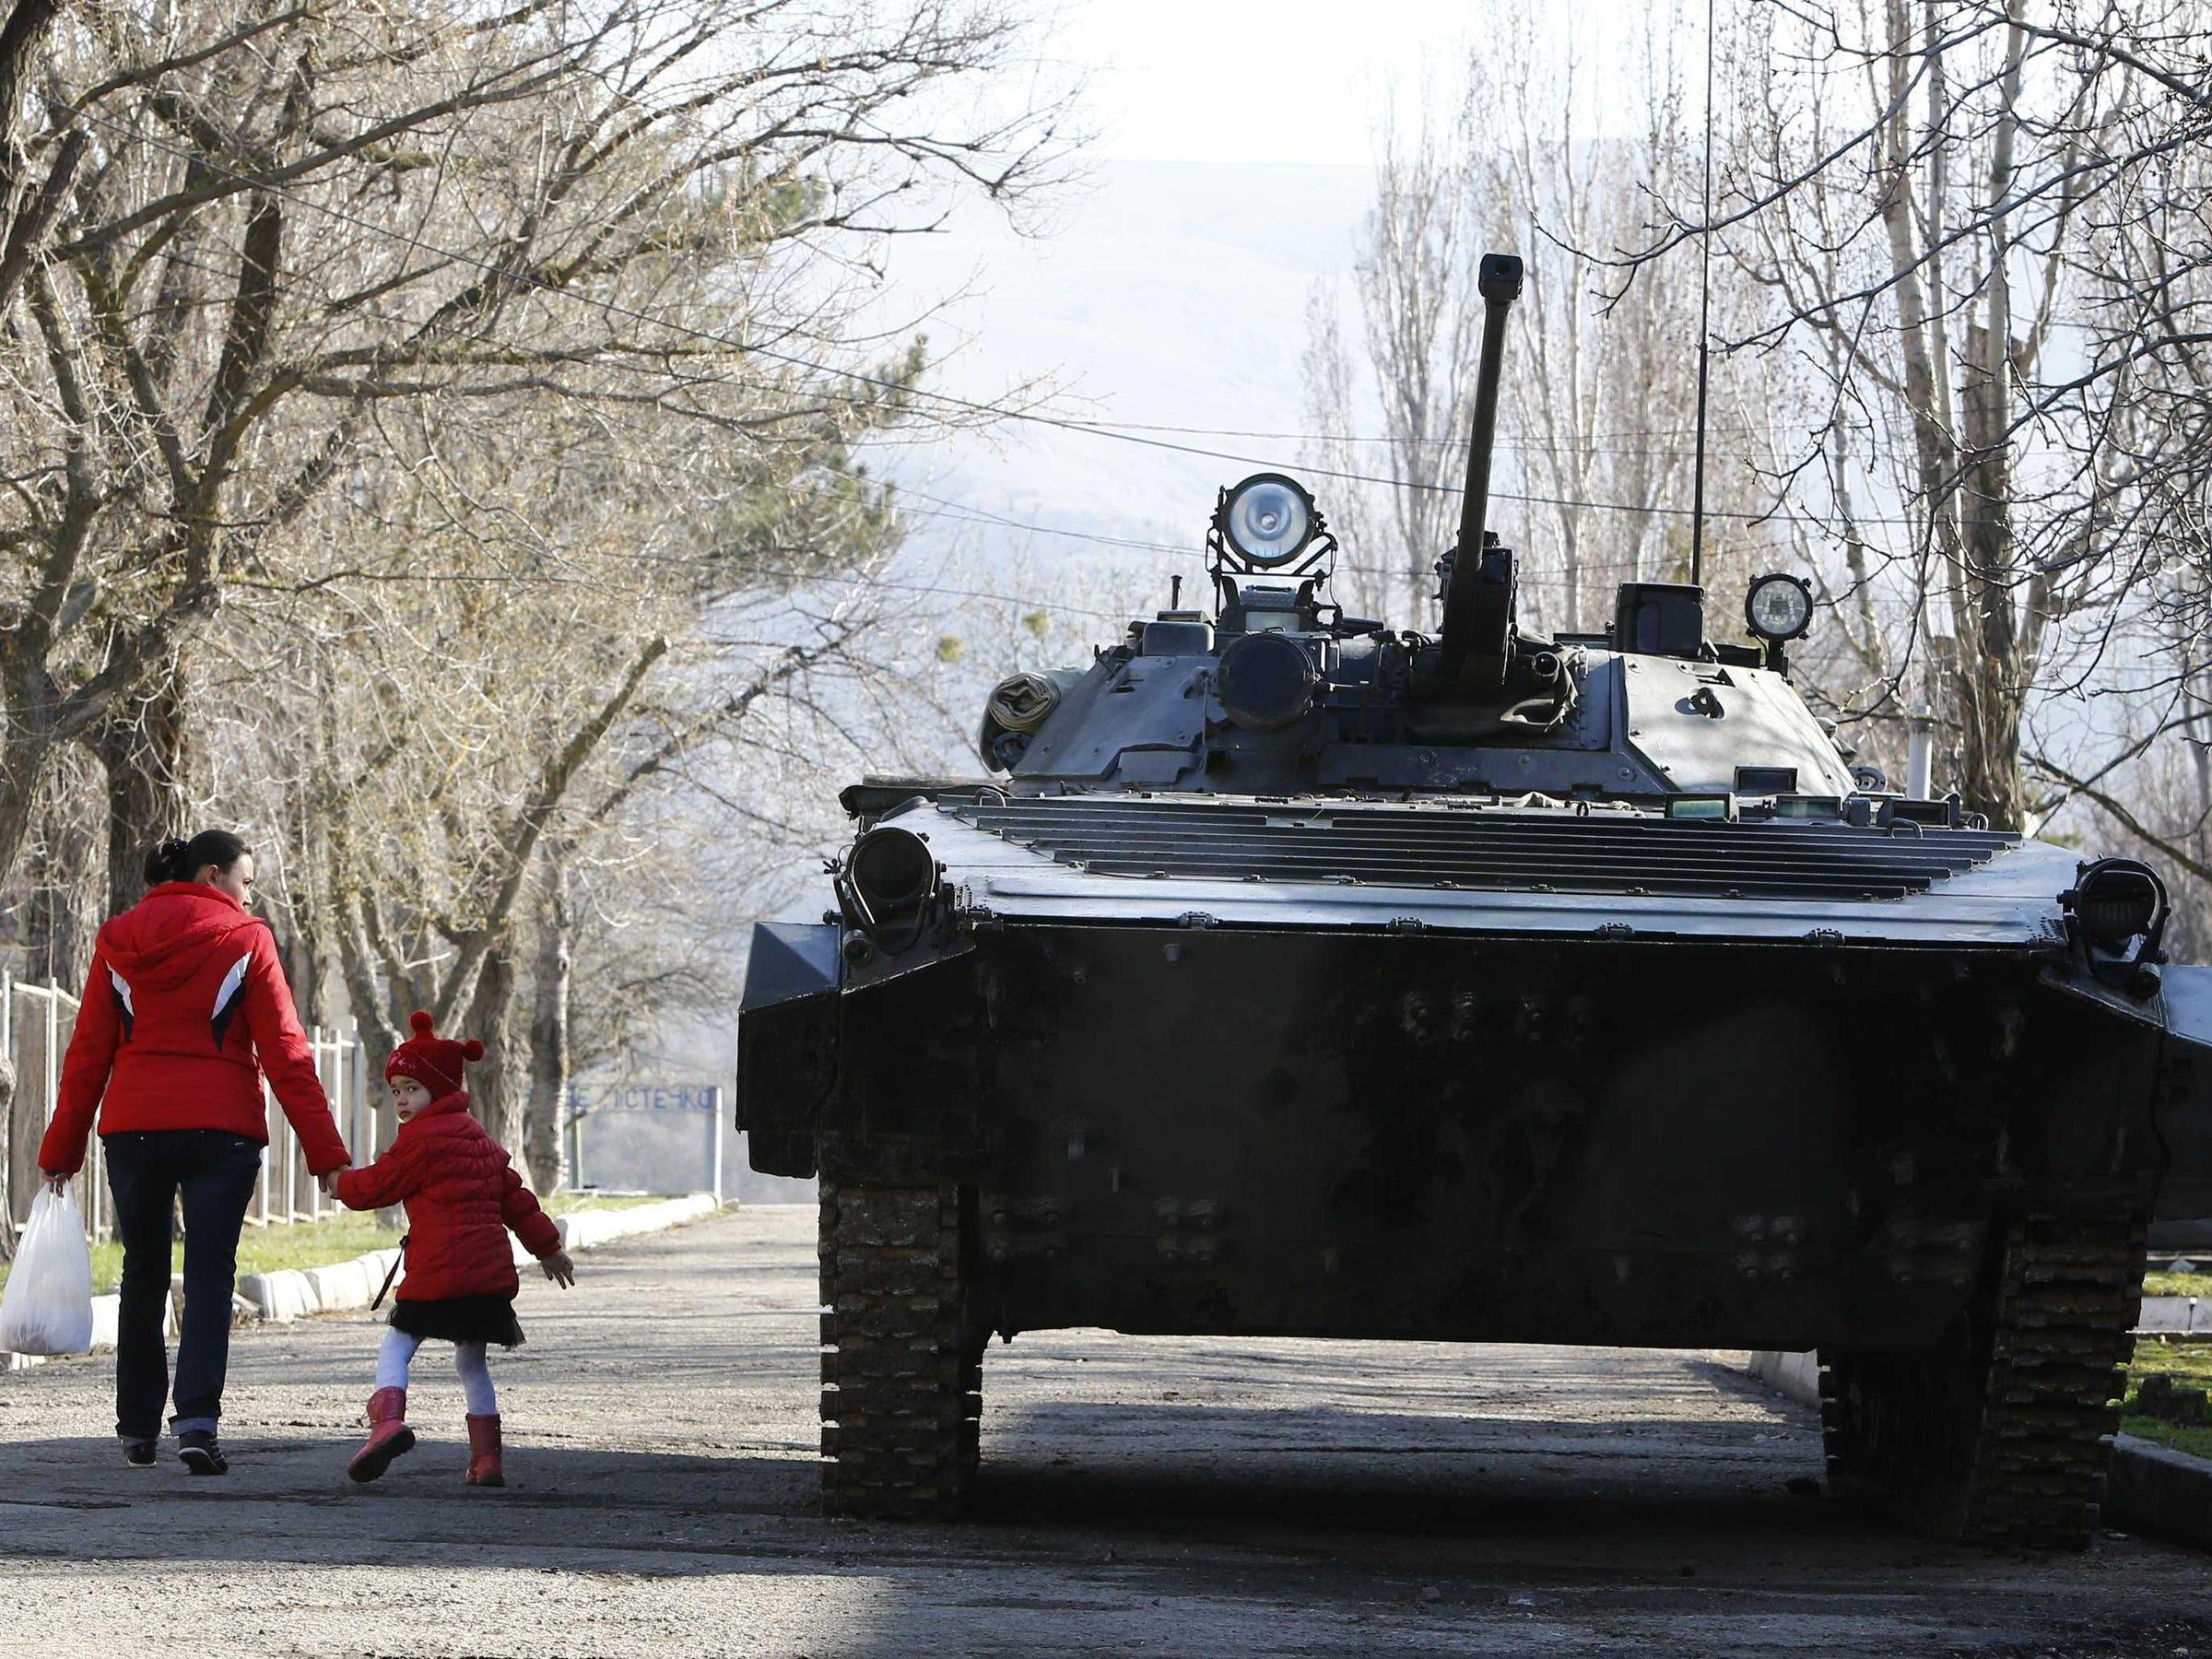 crimea annexed russian vehicle